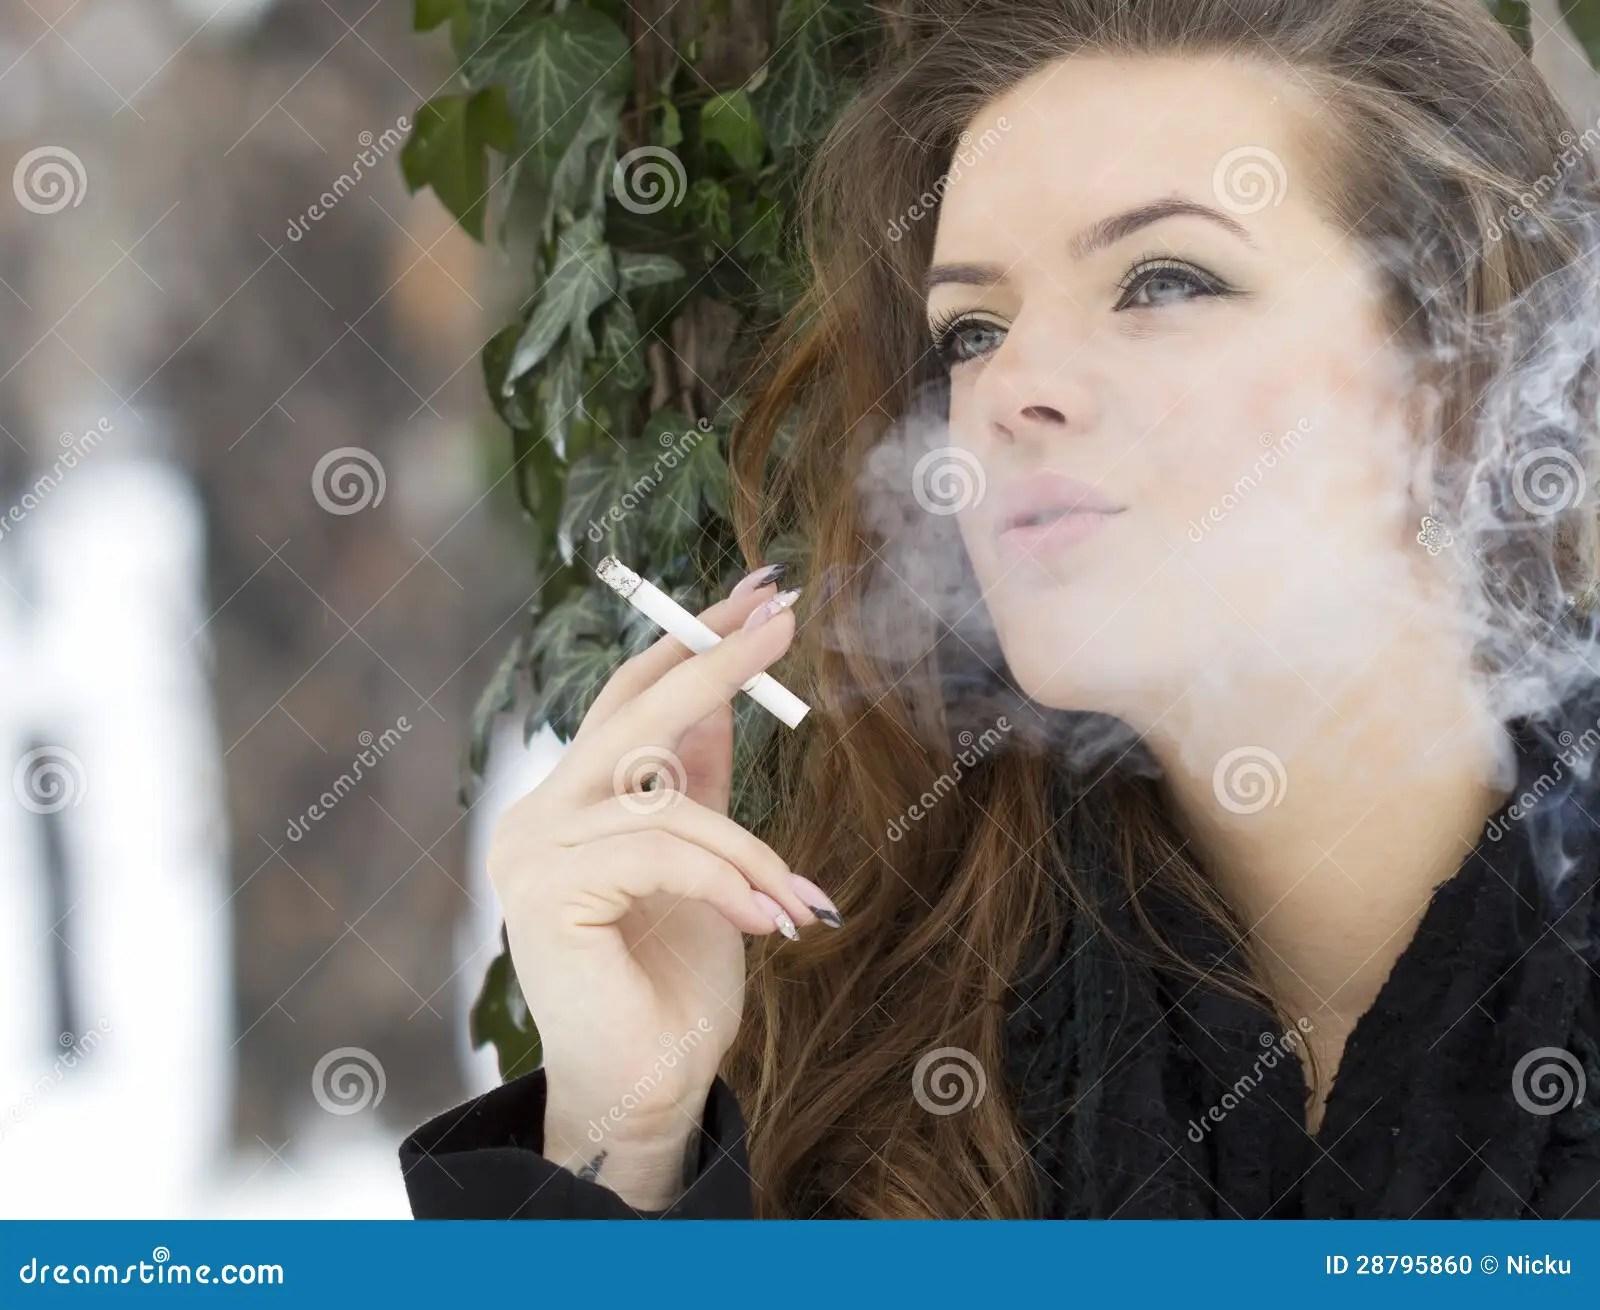 Drunk Girls Hd Wallpaper Cute Woman Smoking Detail Stock Photo Image 28795860